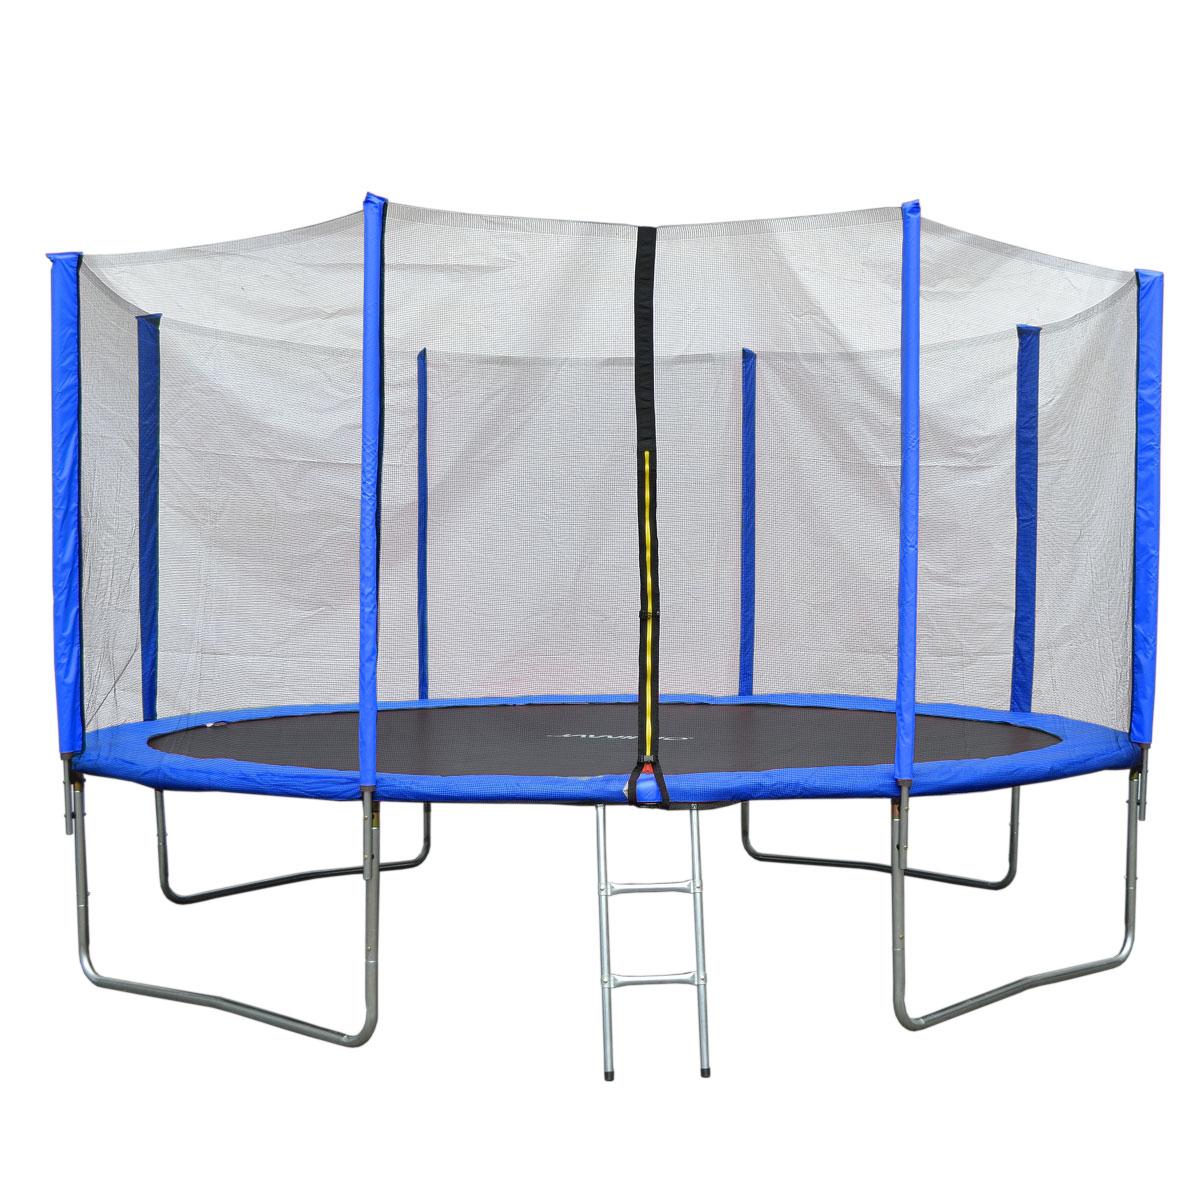 90510 JAWINIO Trampolin 427 cm Gartentrampolin Trampolin Kinder Komplettset Blau